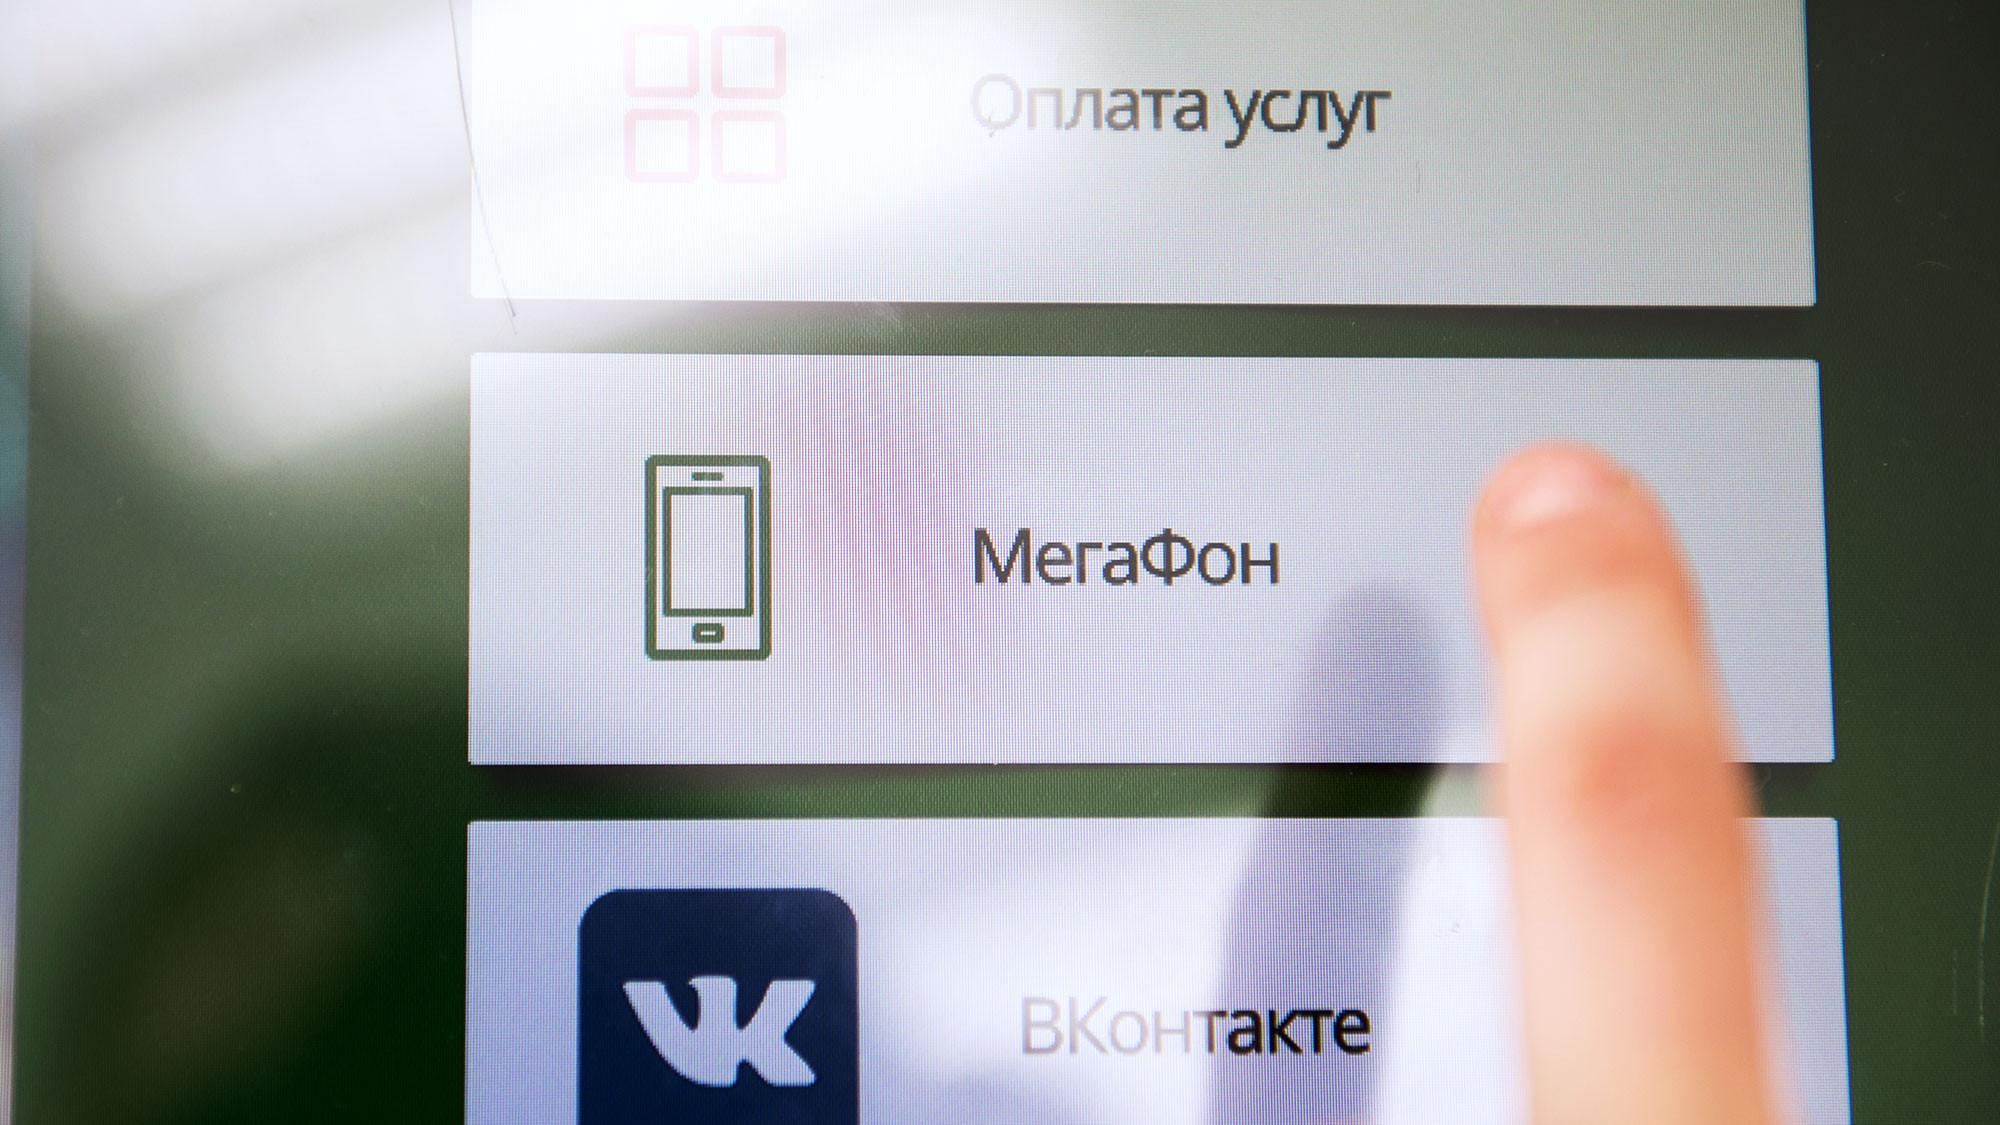 <p>Фото: &copy; РИА Новости /&nbsp;Алексей Мальгавко</p>